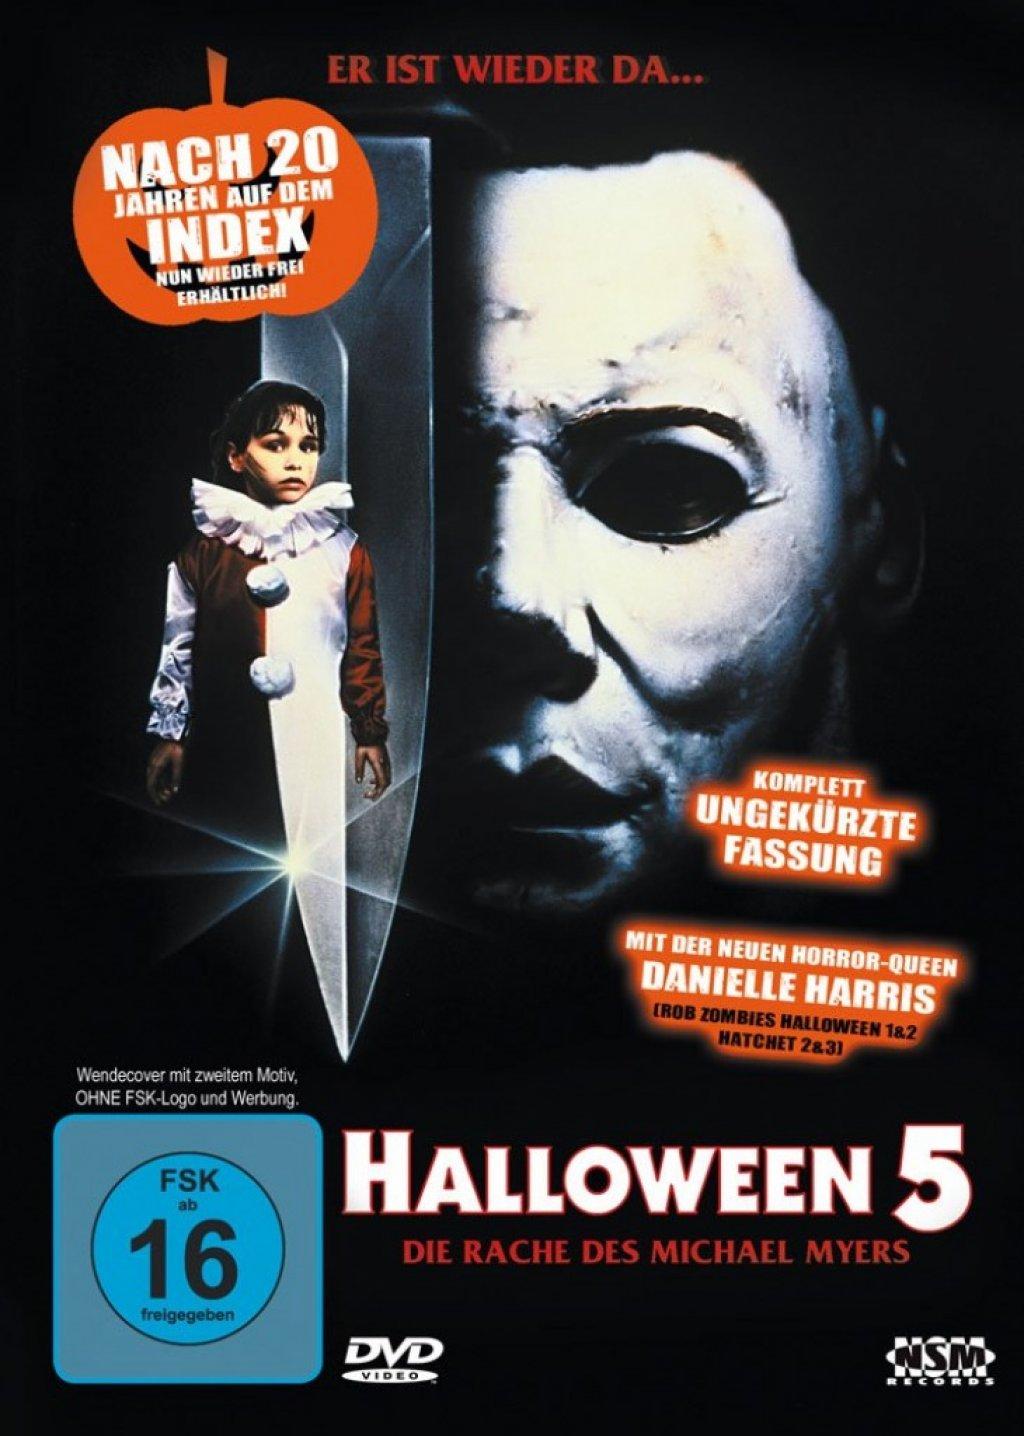 Halloween 5 - Die Rache des Michael Myers (DVD)